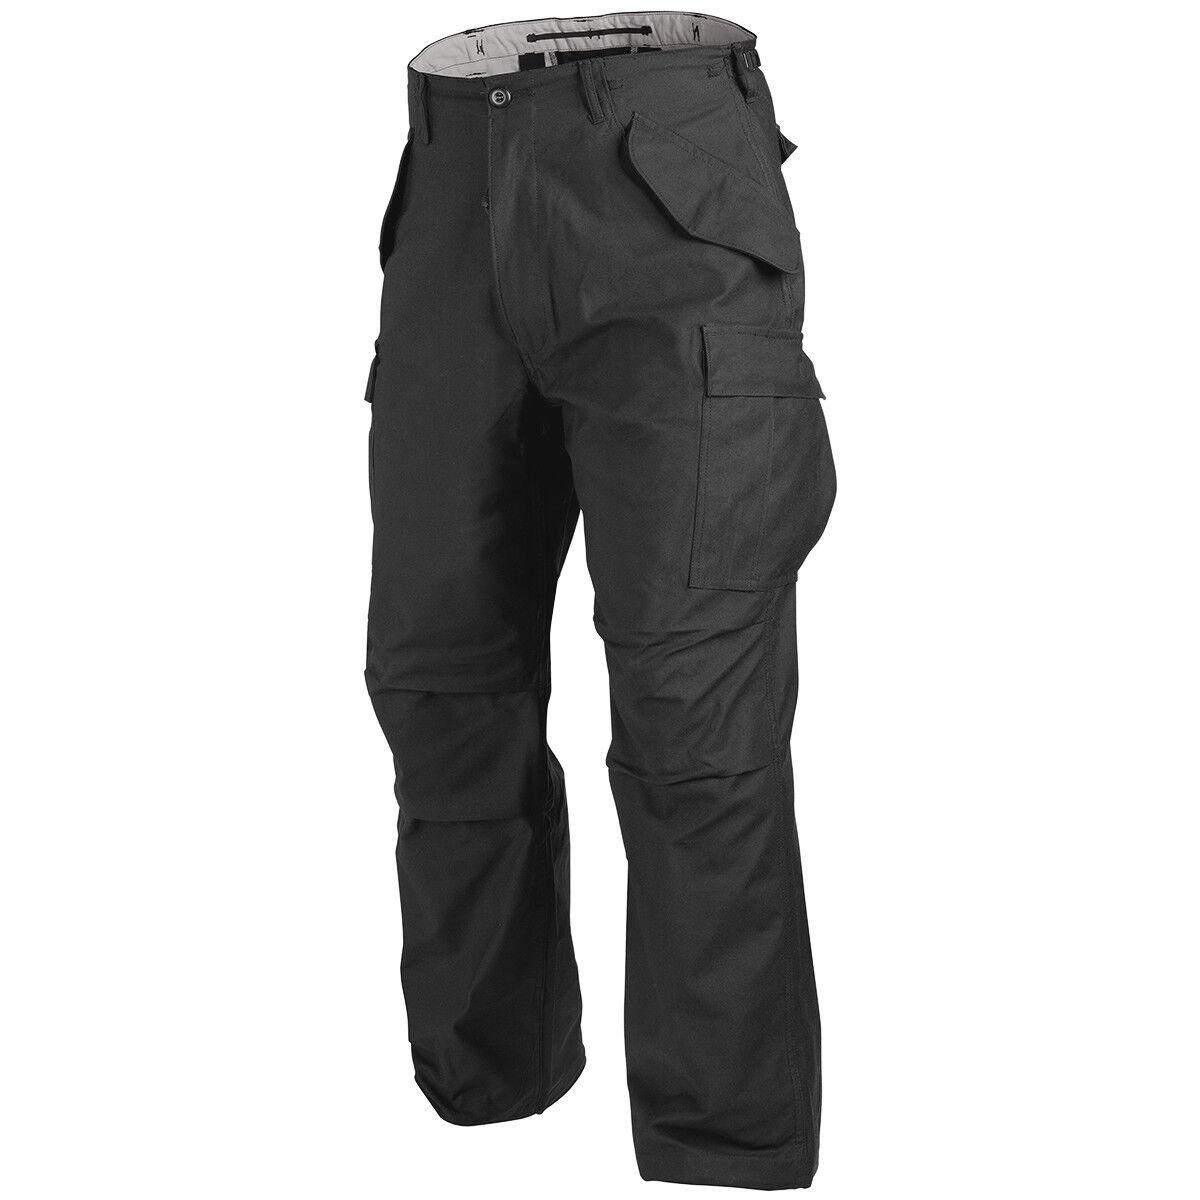 Nyco Helikon Genuino Us M65 Combat Cargo uomo Pantalone Esercito Pantaloni Mi